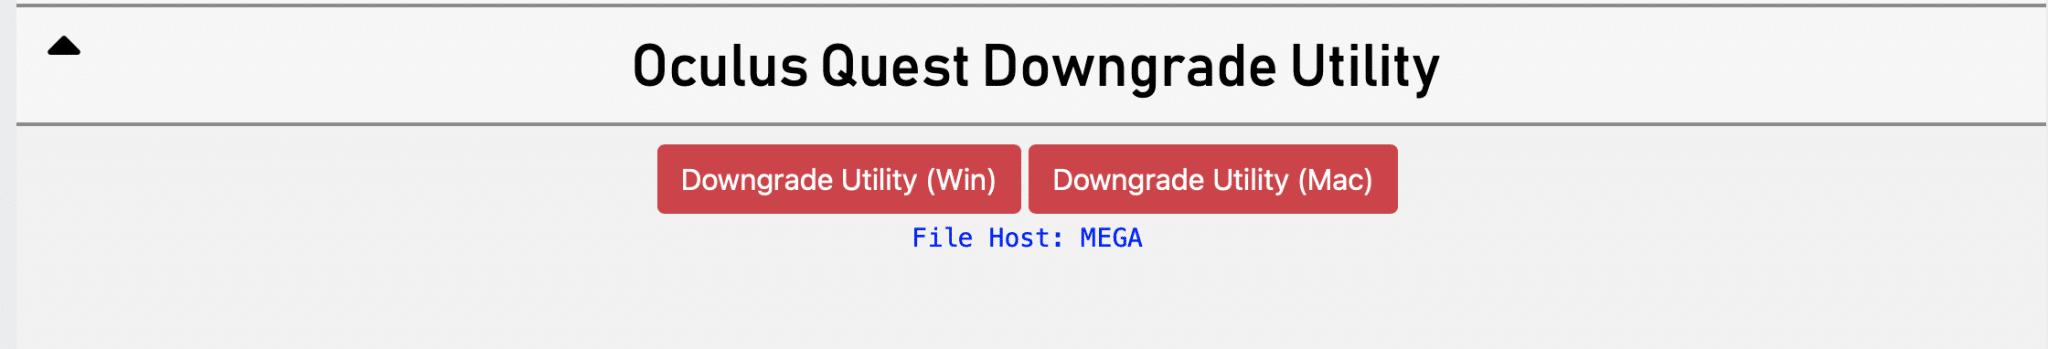 1 - download BSLegacy software